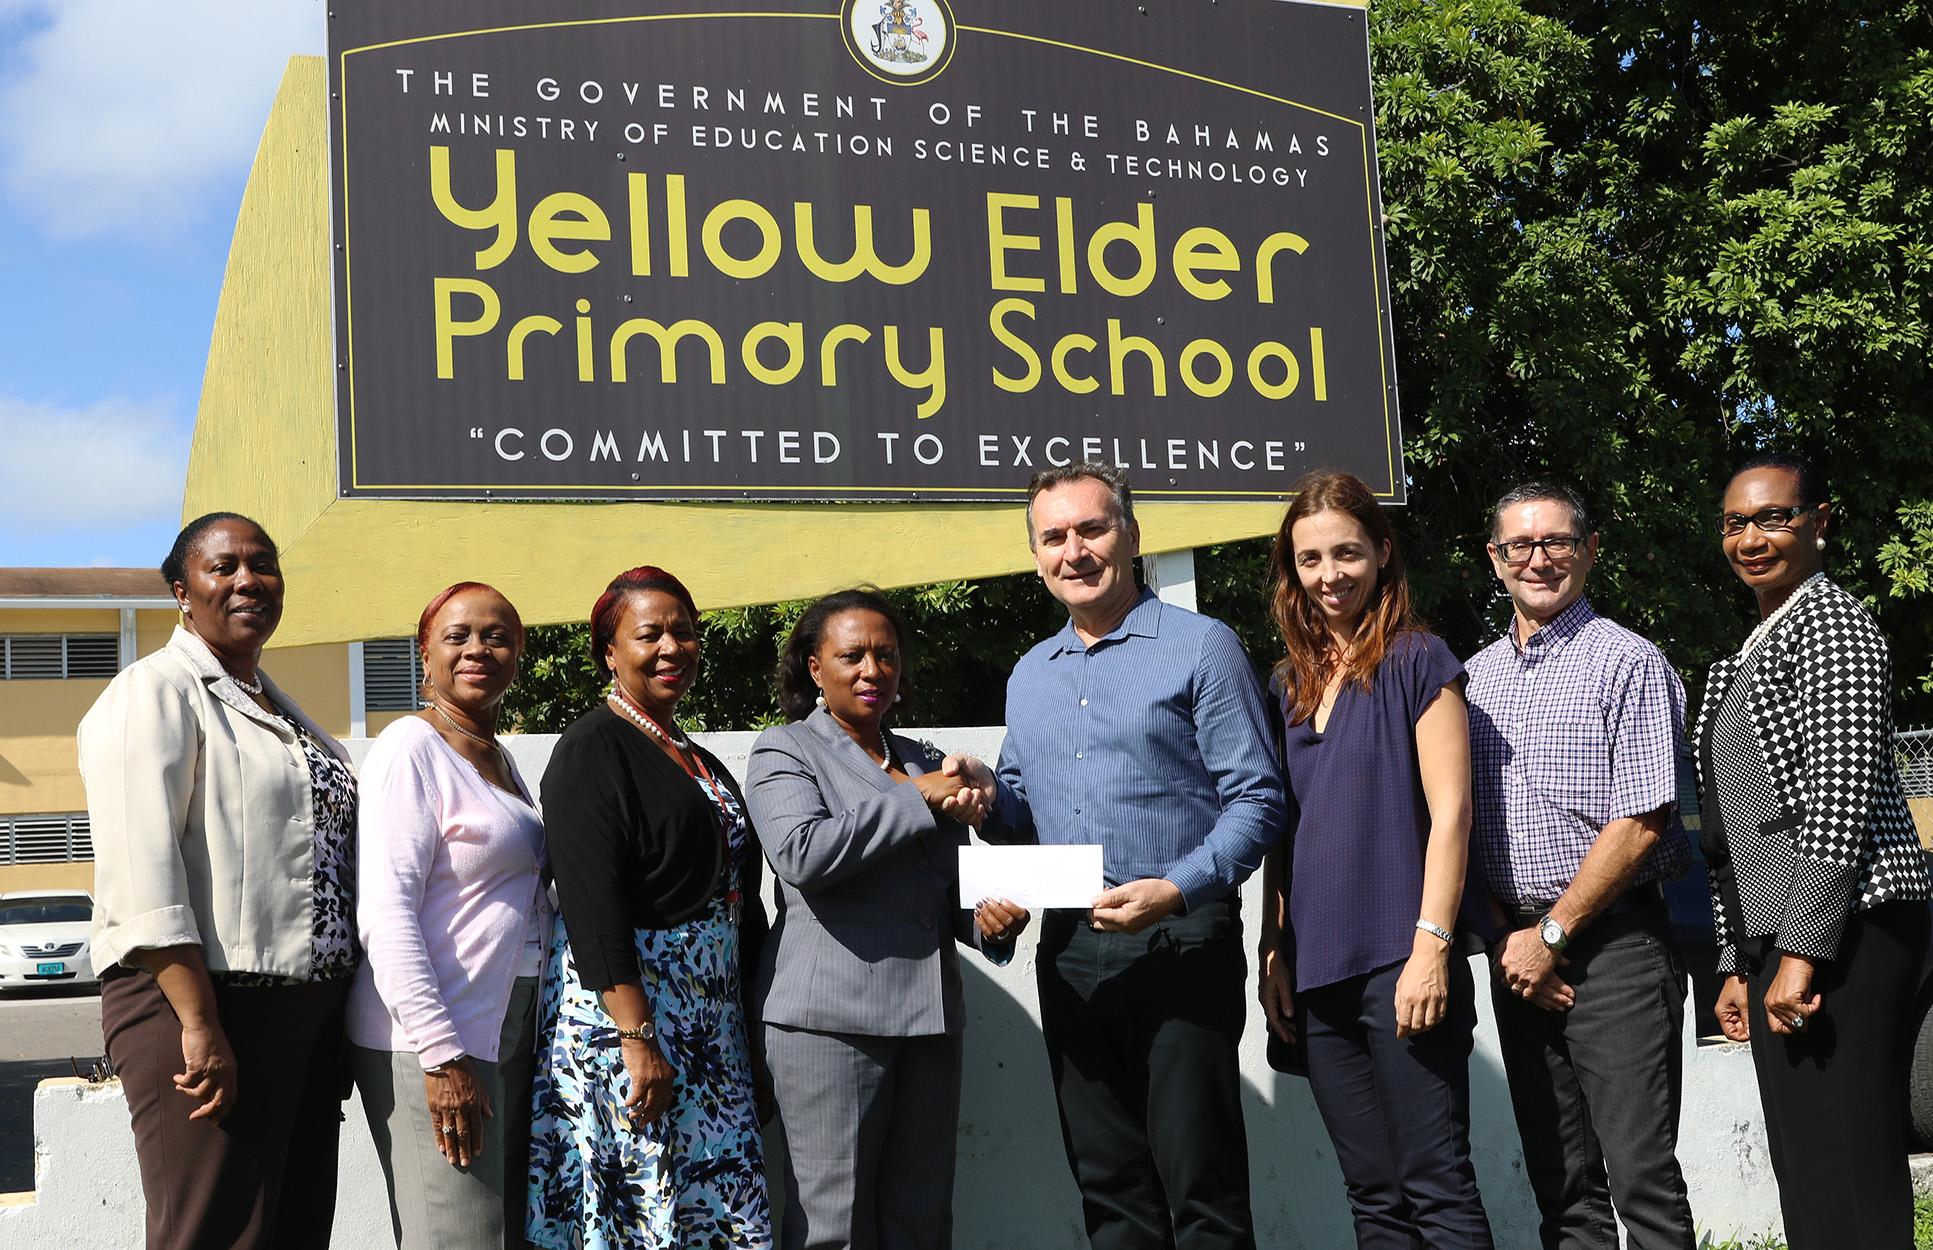 Italian Bahamian community donates to Yellow Elder Primary